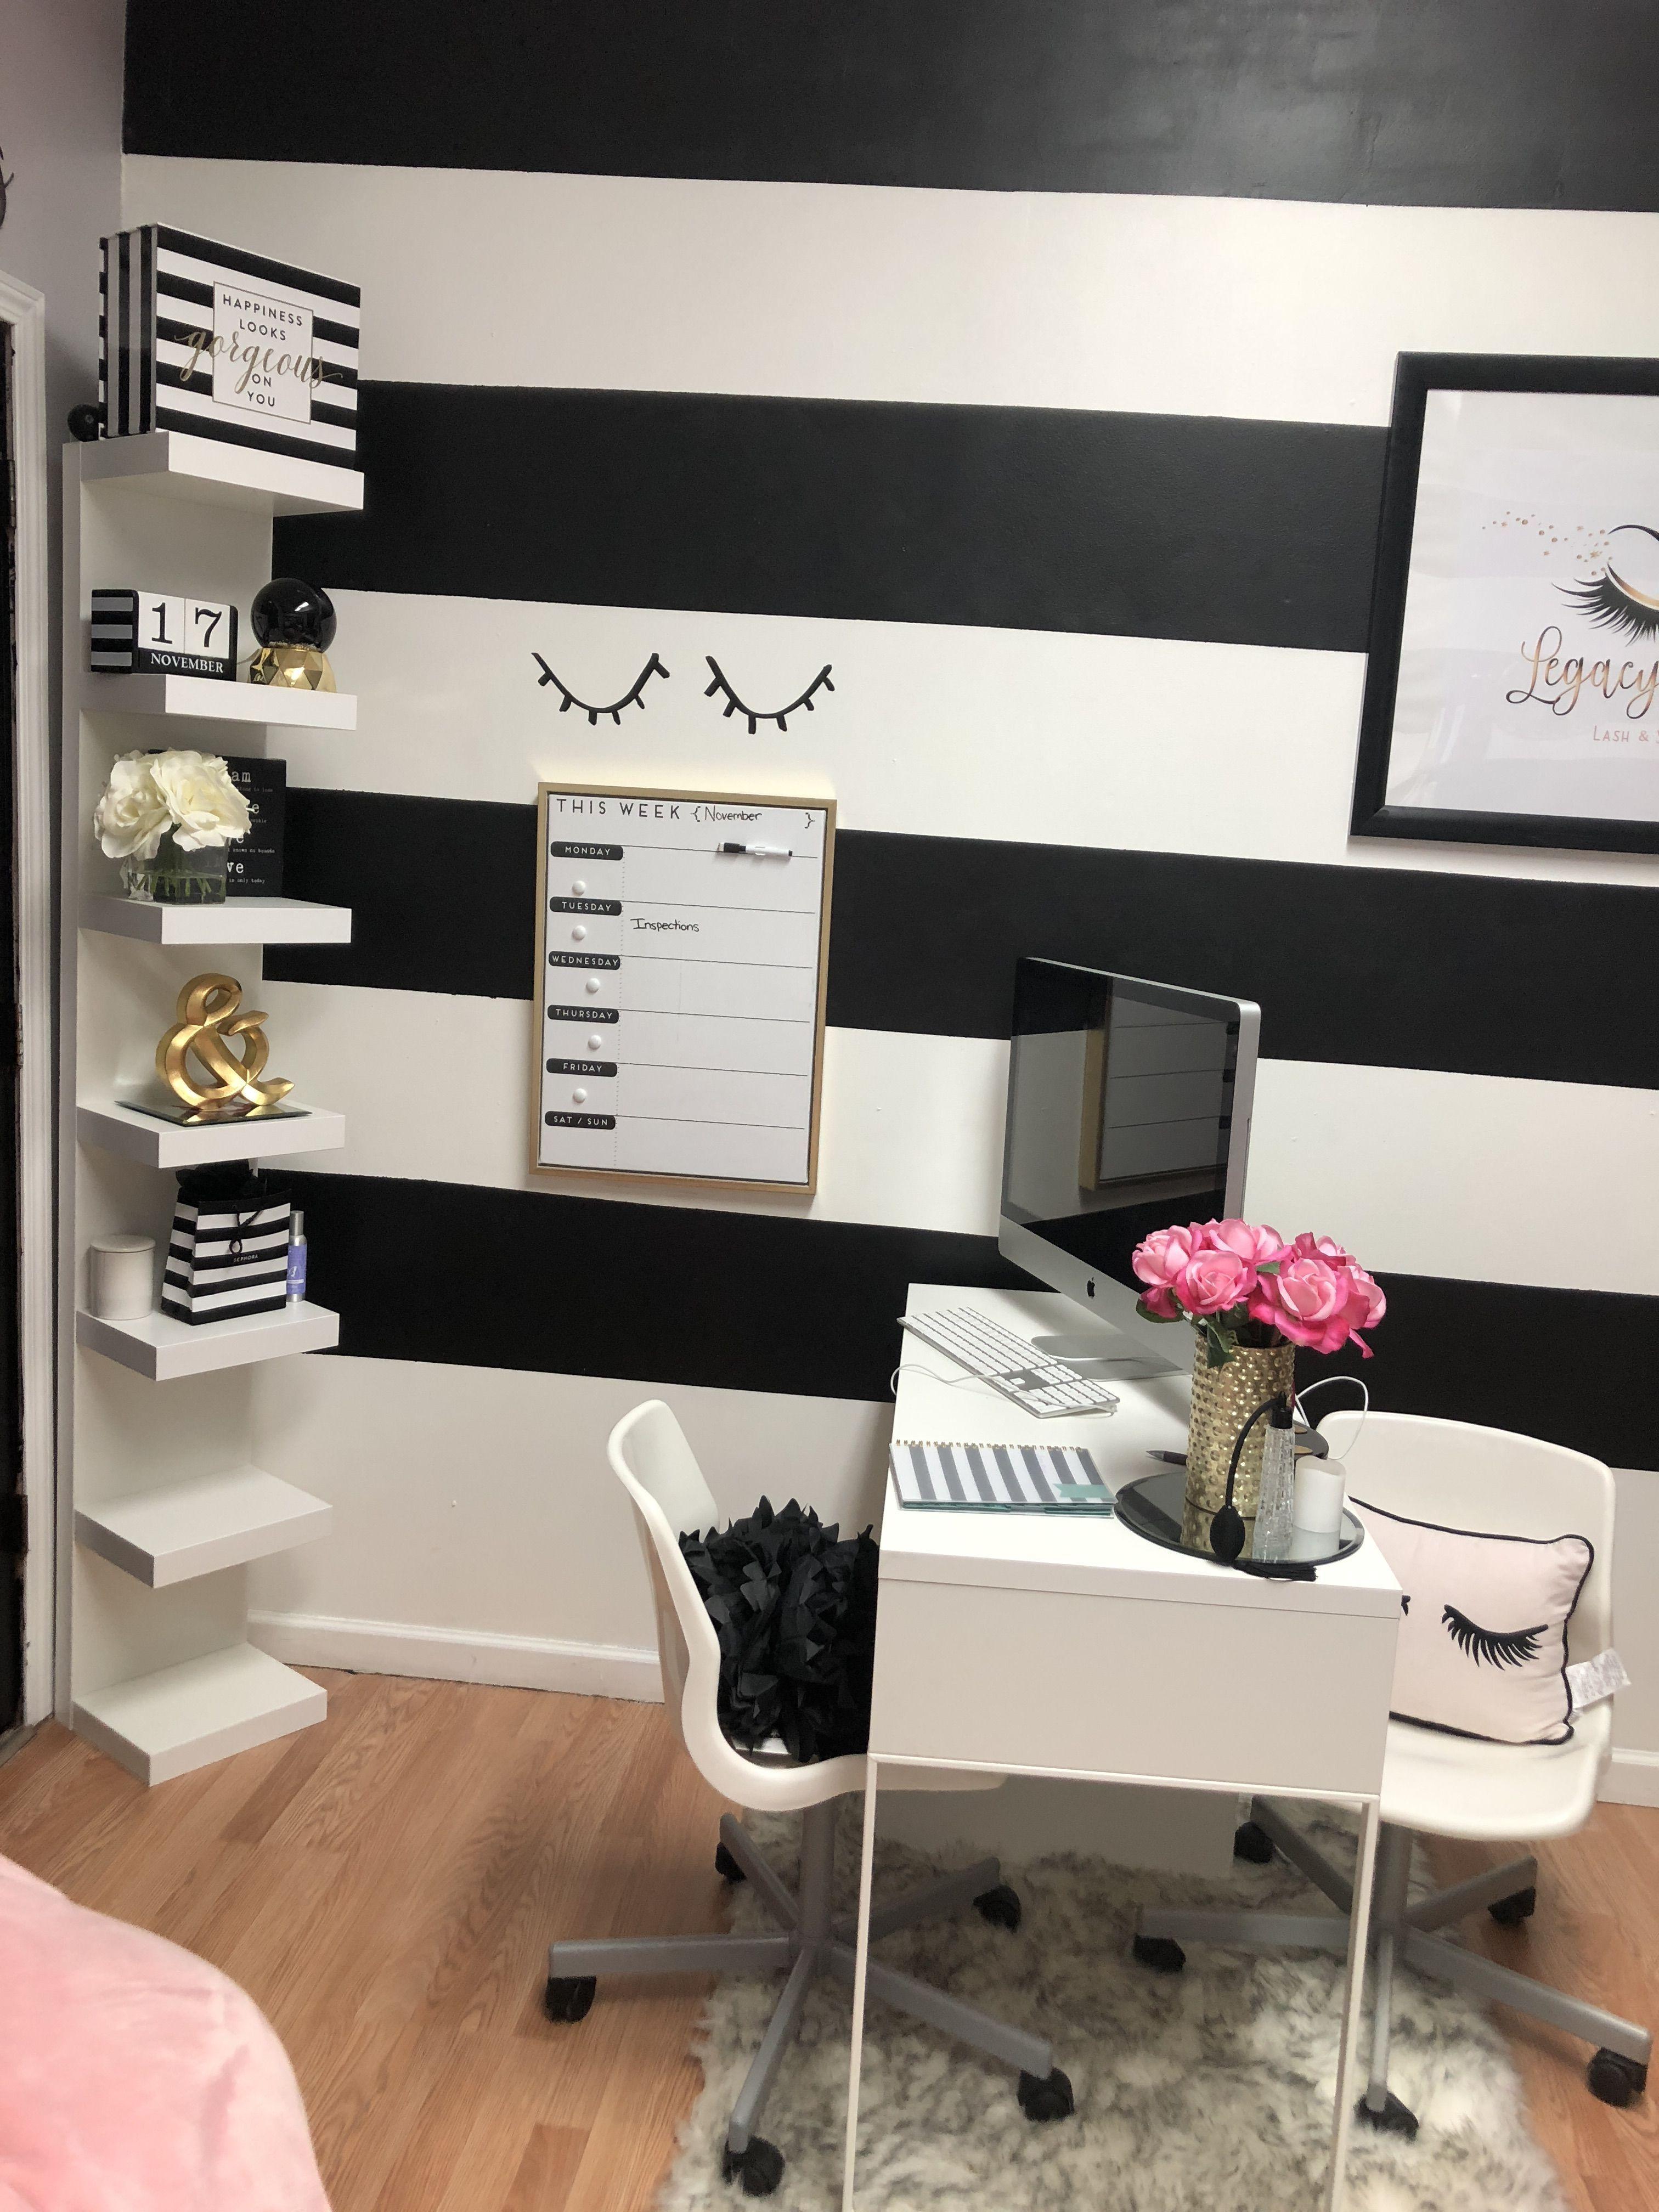 Beauty Studio Estheticianroomideas Beauty Studio Atelie De Beleza Estheticianroomideas Atelie D In 2020 Esthetician Room Decor Beauty Room Decor Esthetician Room